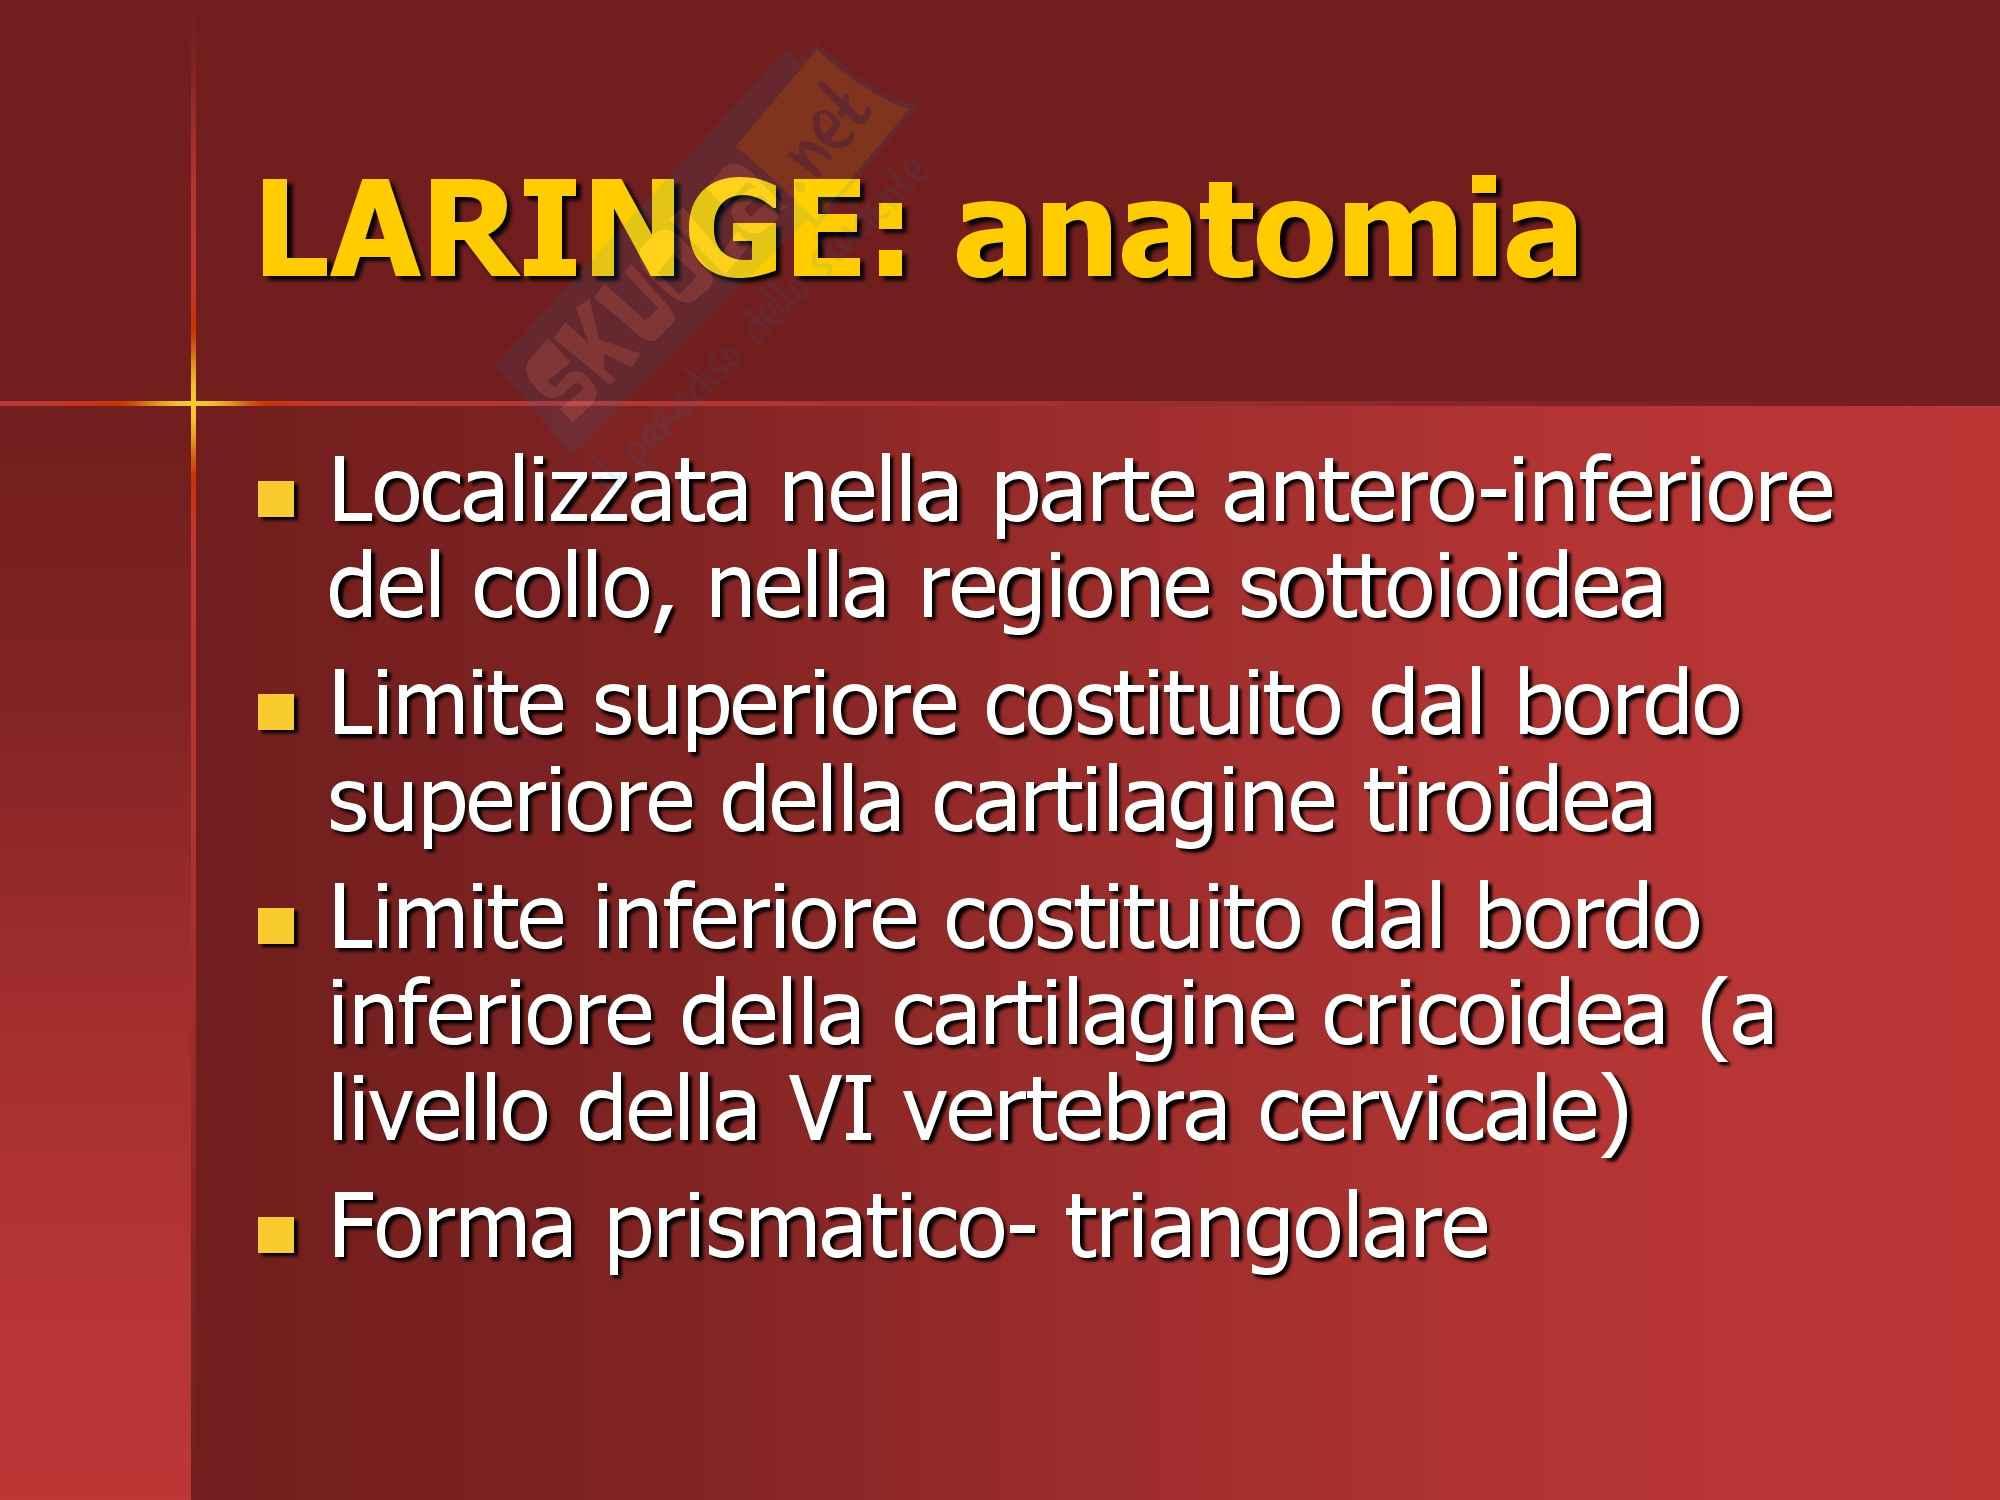 Otorinolaringoiatria - anatomia laringe